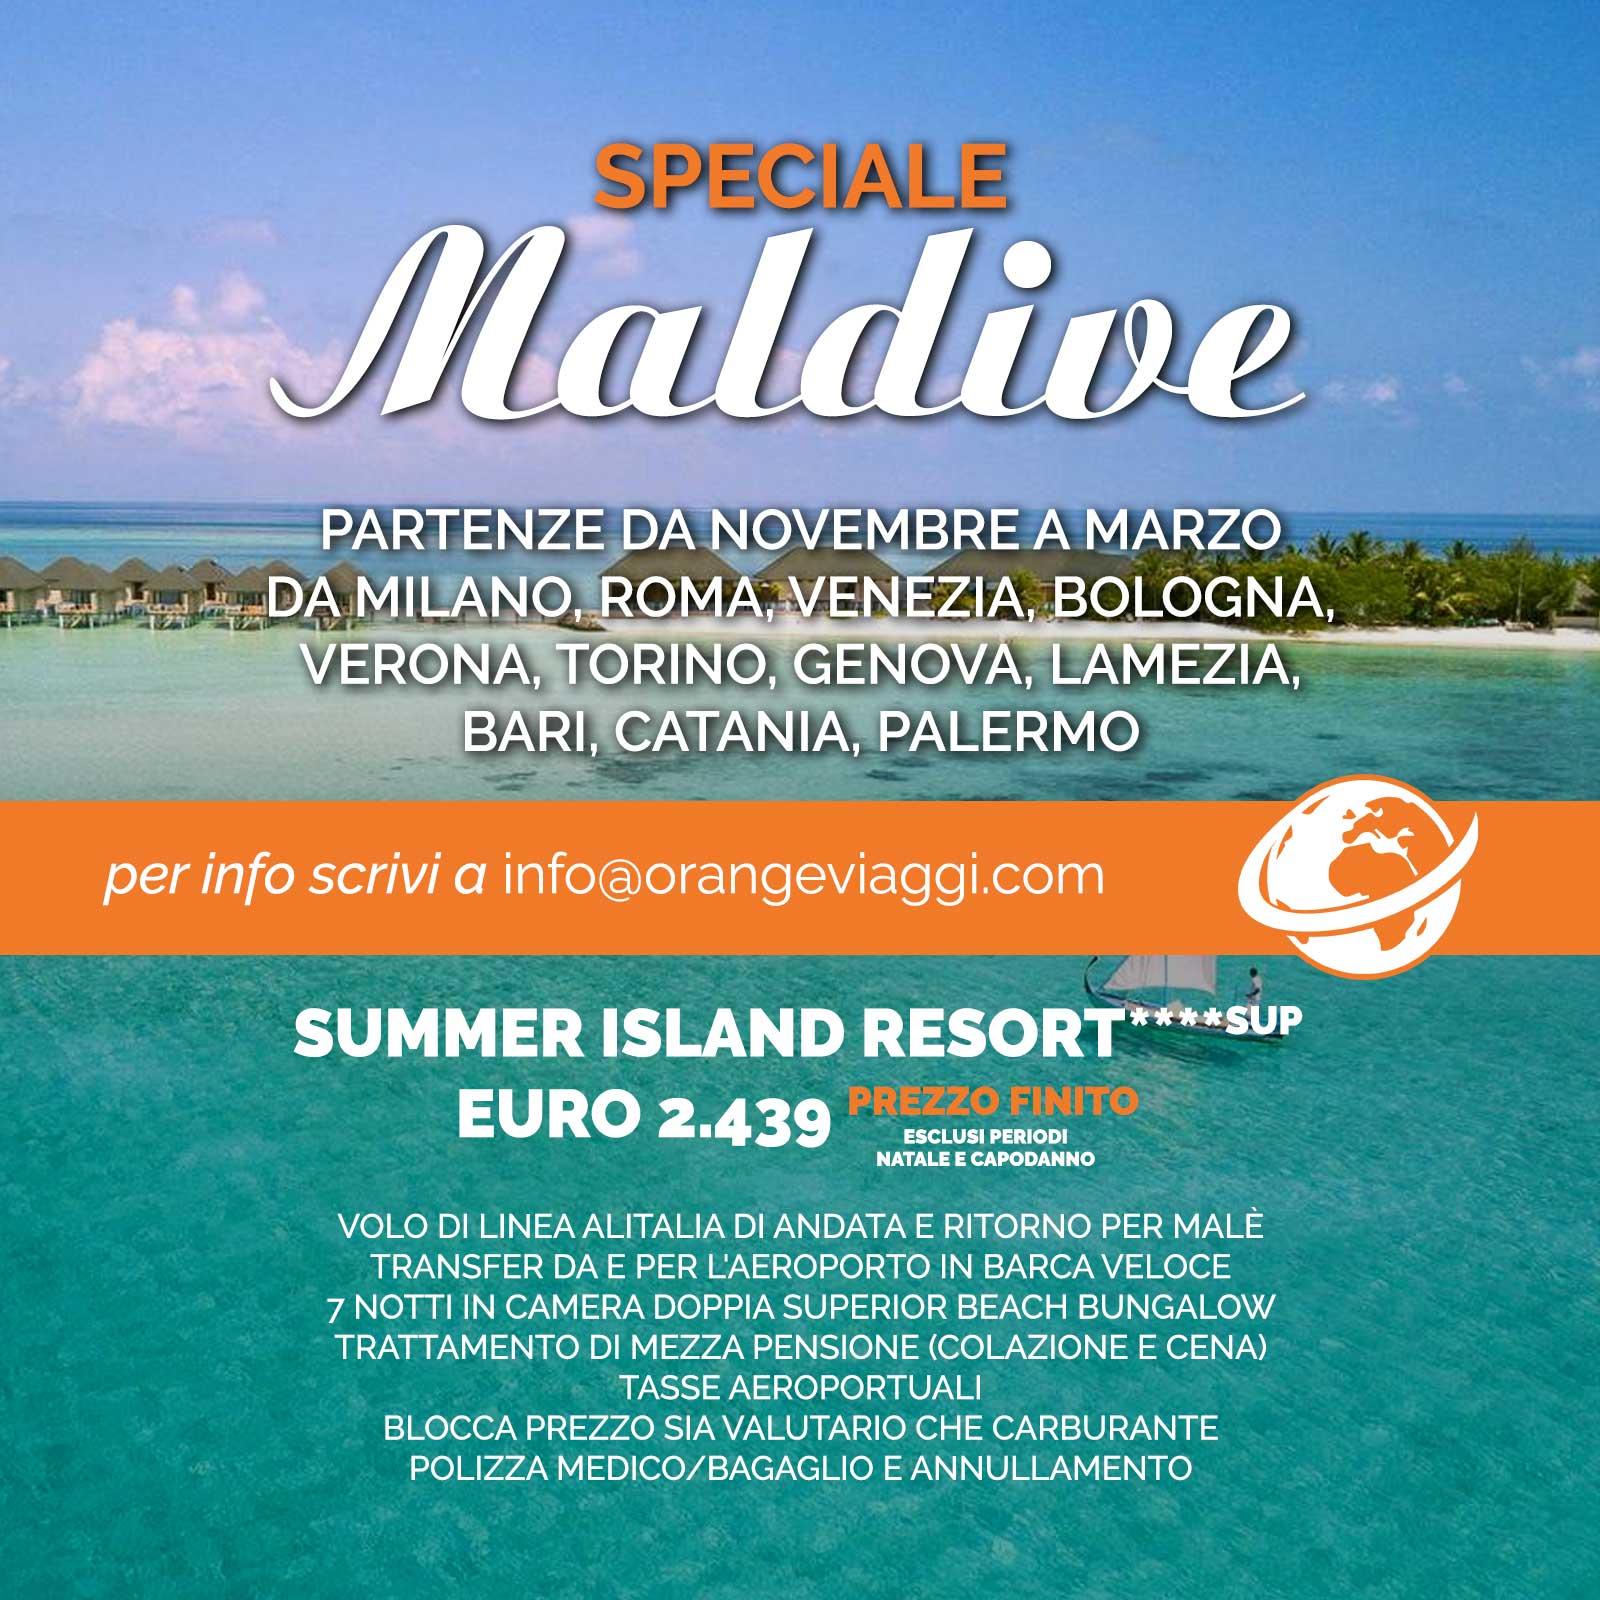 Offerta Speciale Maldive Summer Island Resort | Orange Viaggi